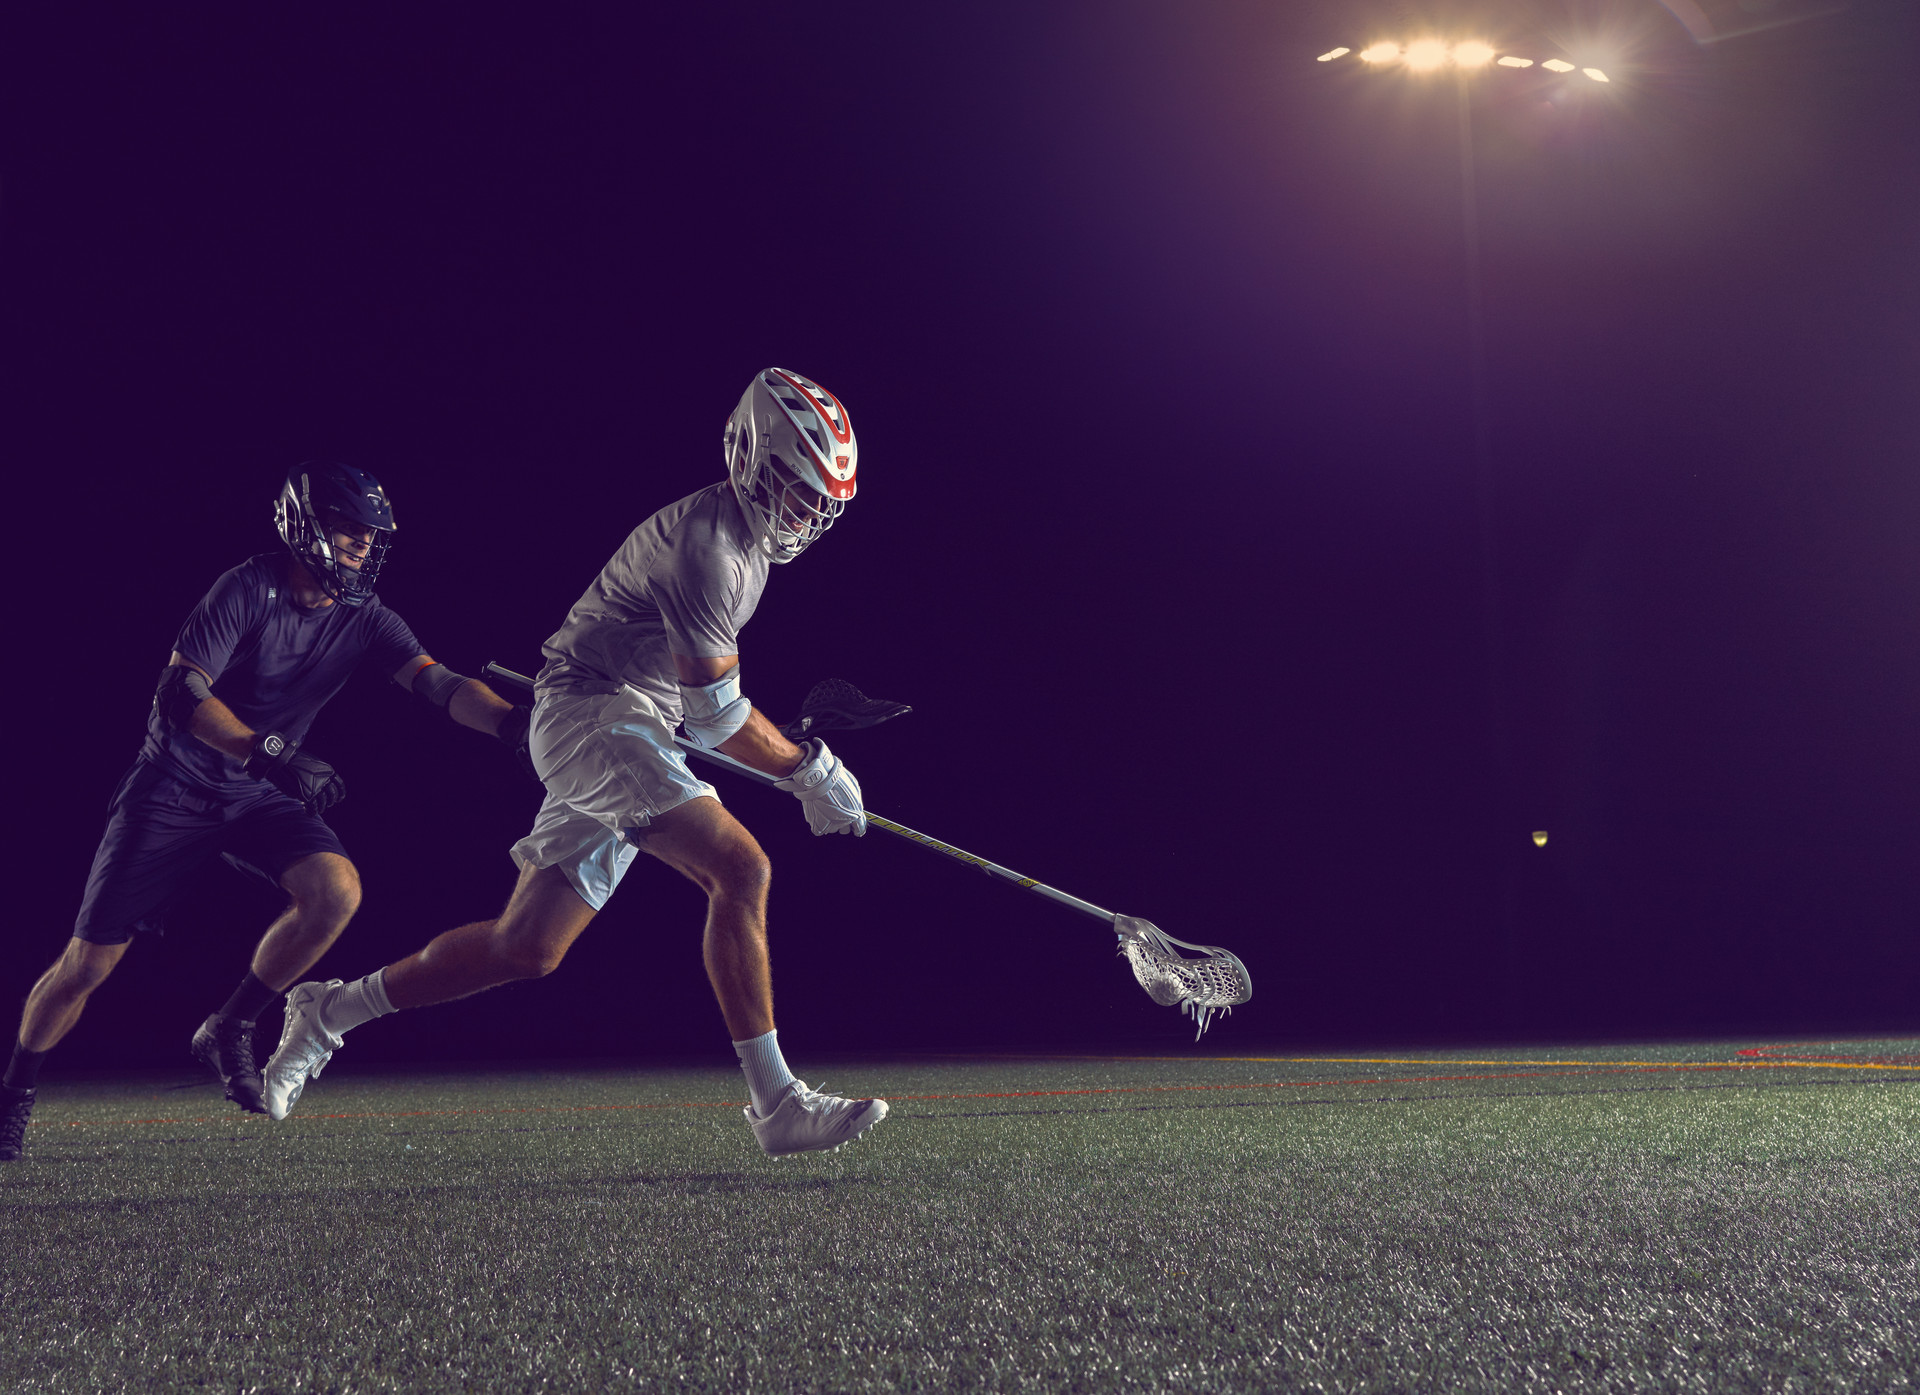 Kyle Hartzell lacrosse